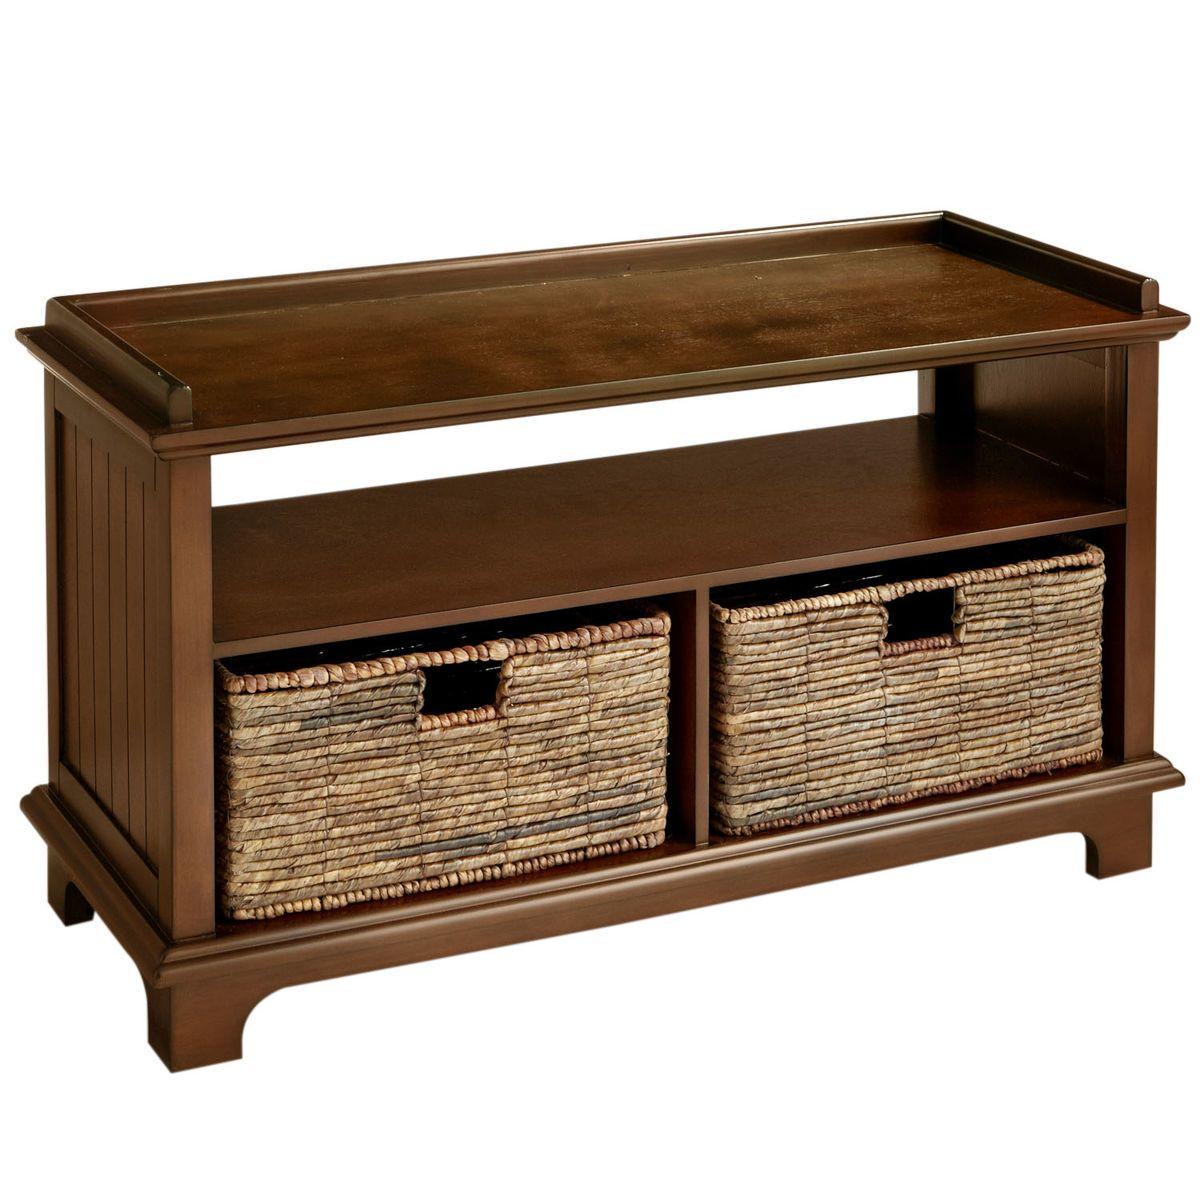 Holtom Chestnut Brown Storage Bench With Baskets